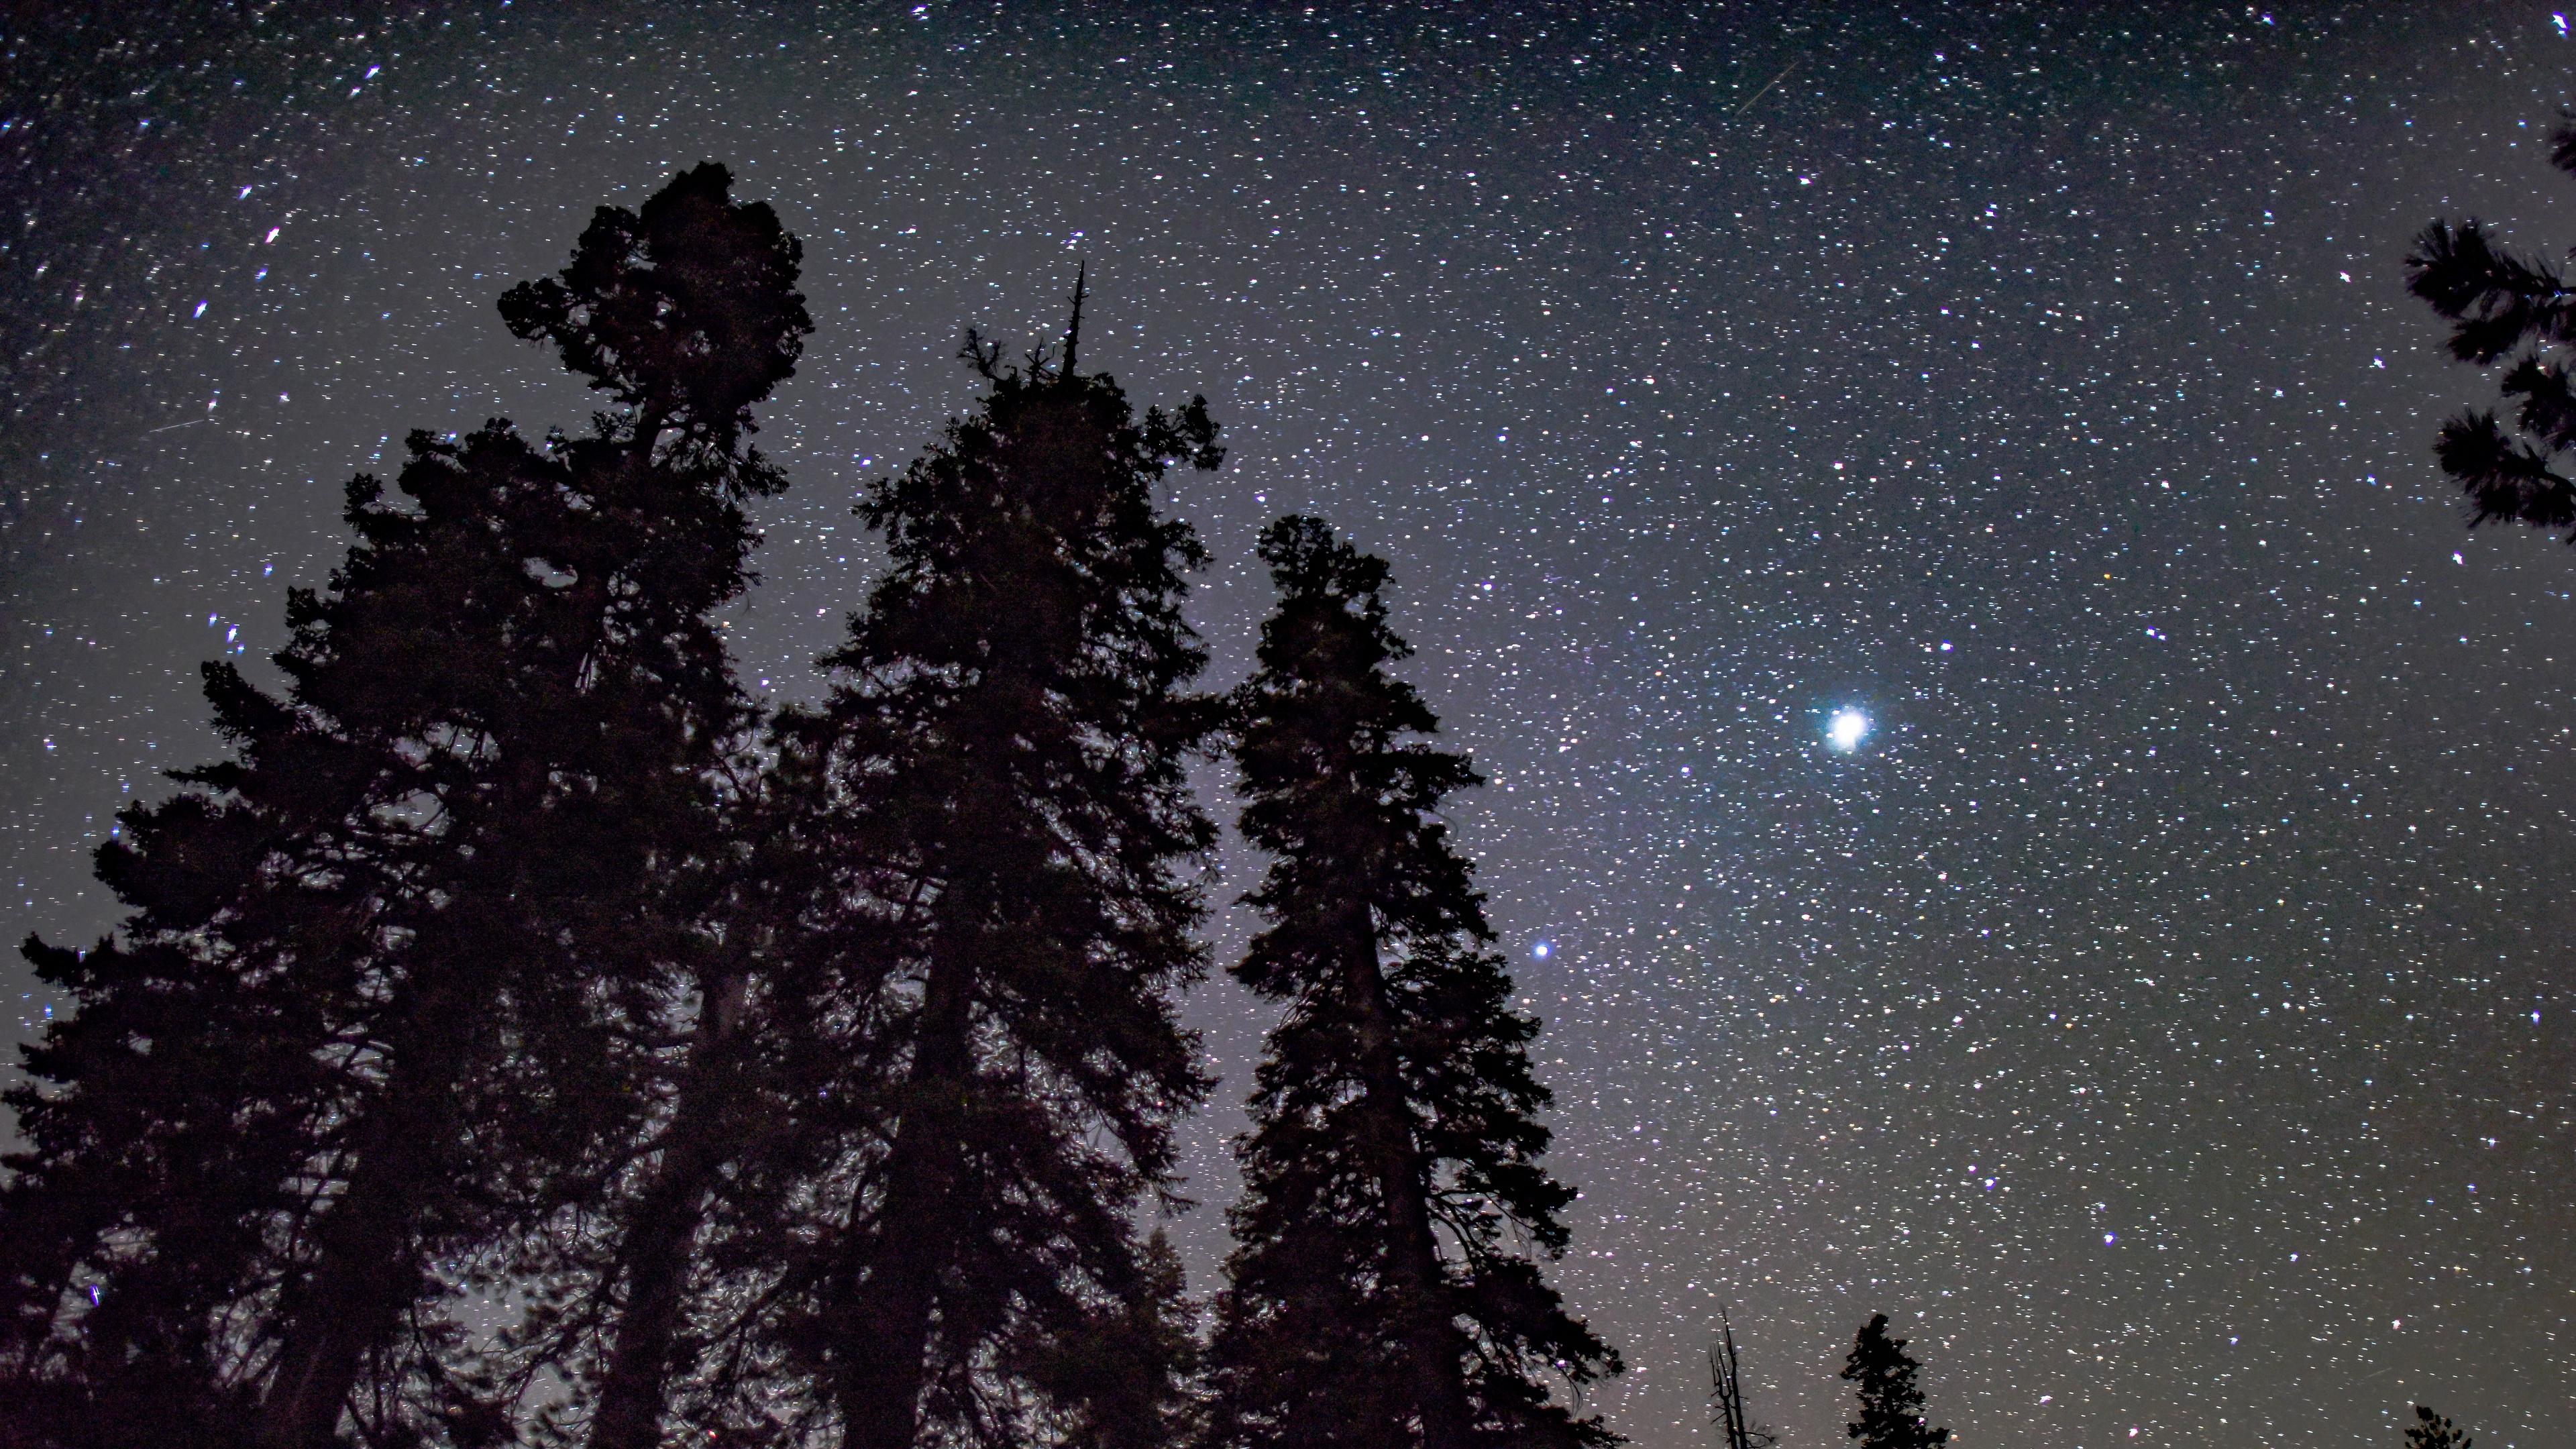 starry sky trees night stars glitter radiance 4k 1541117780 - starry sky, trees, night, stars, glitter, radiance 4k - Trees, starry sky, Night